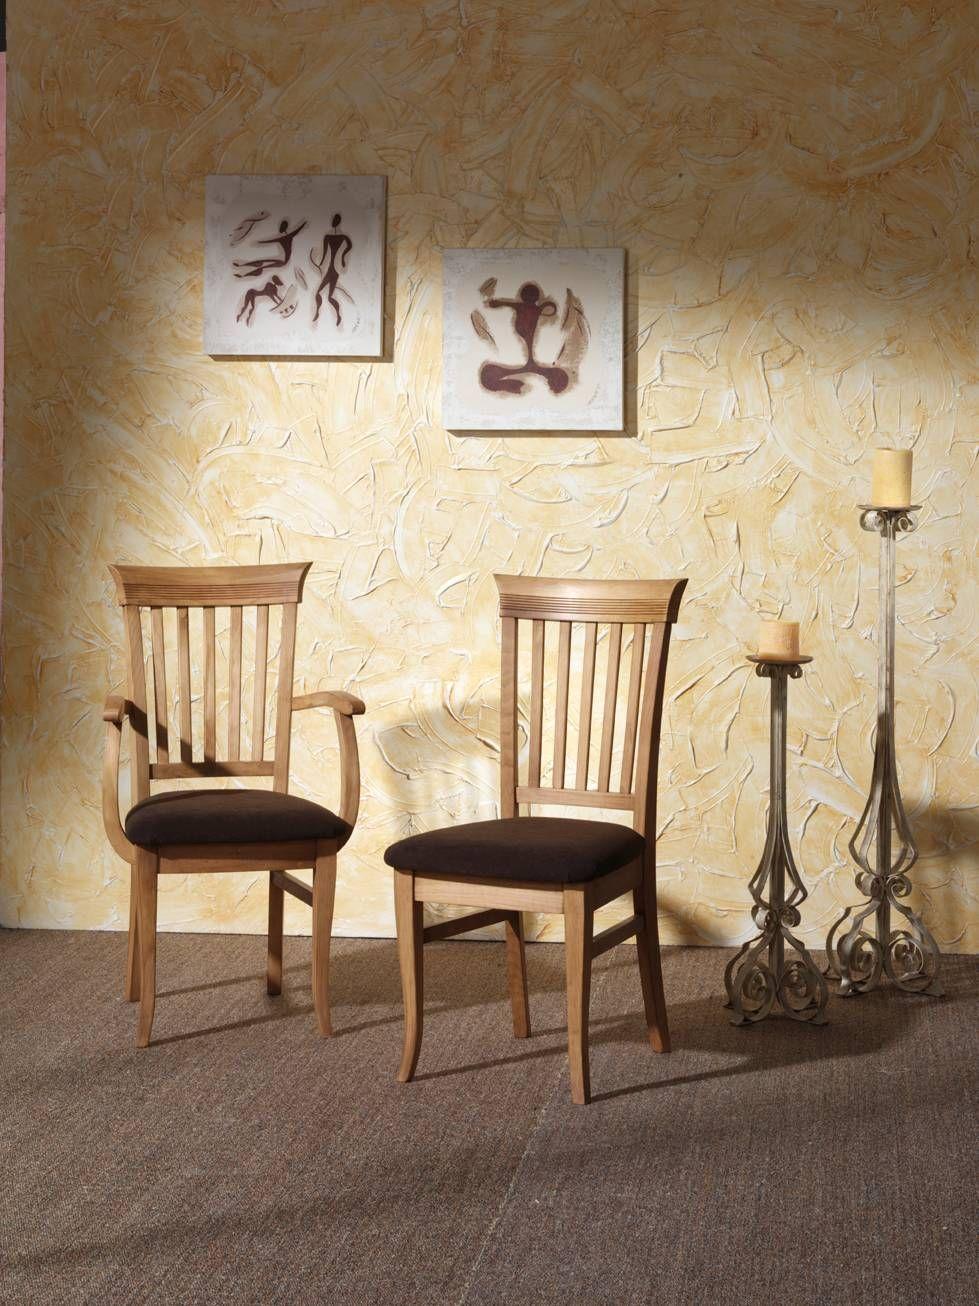 Silla de comedor m 99 de madera de pino maciza con asiento de madera o tapizado remodelacion - Tapizado de sillas de comedor ...